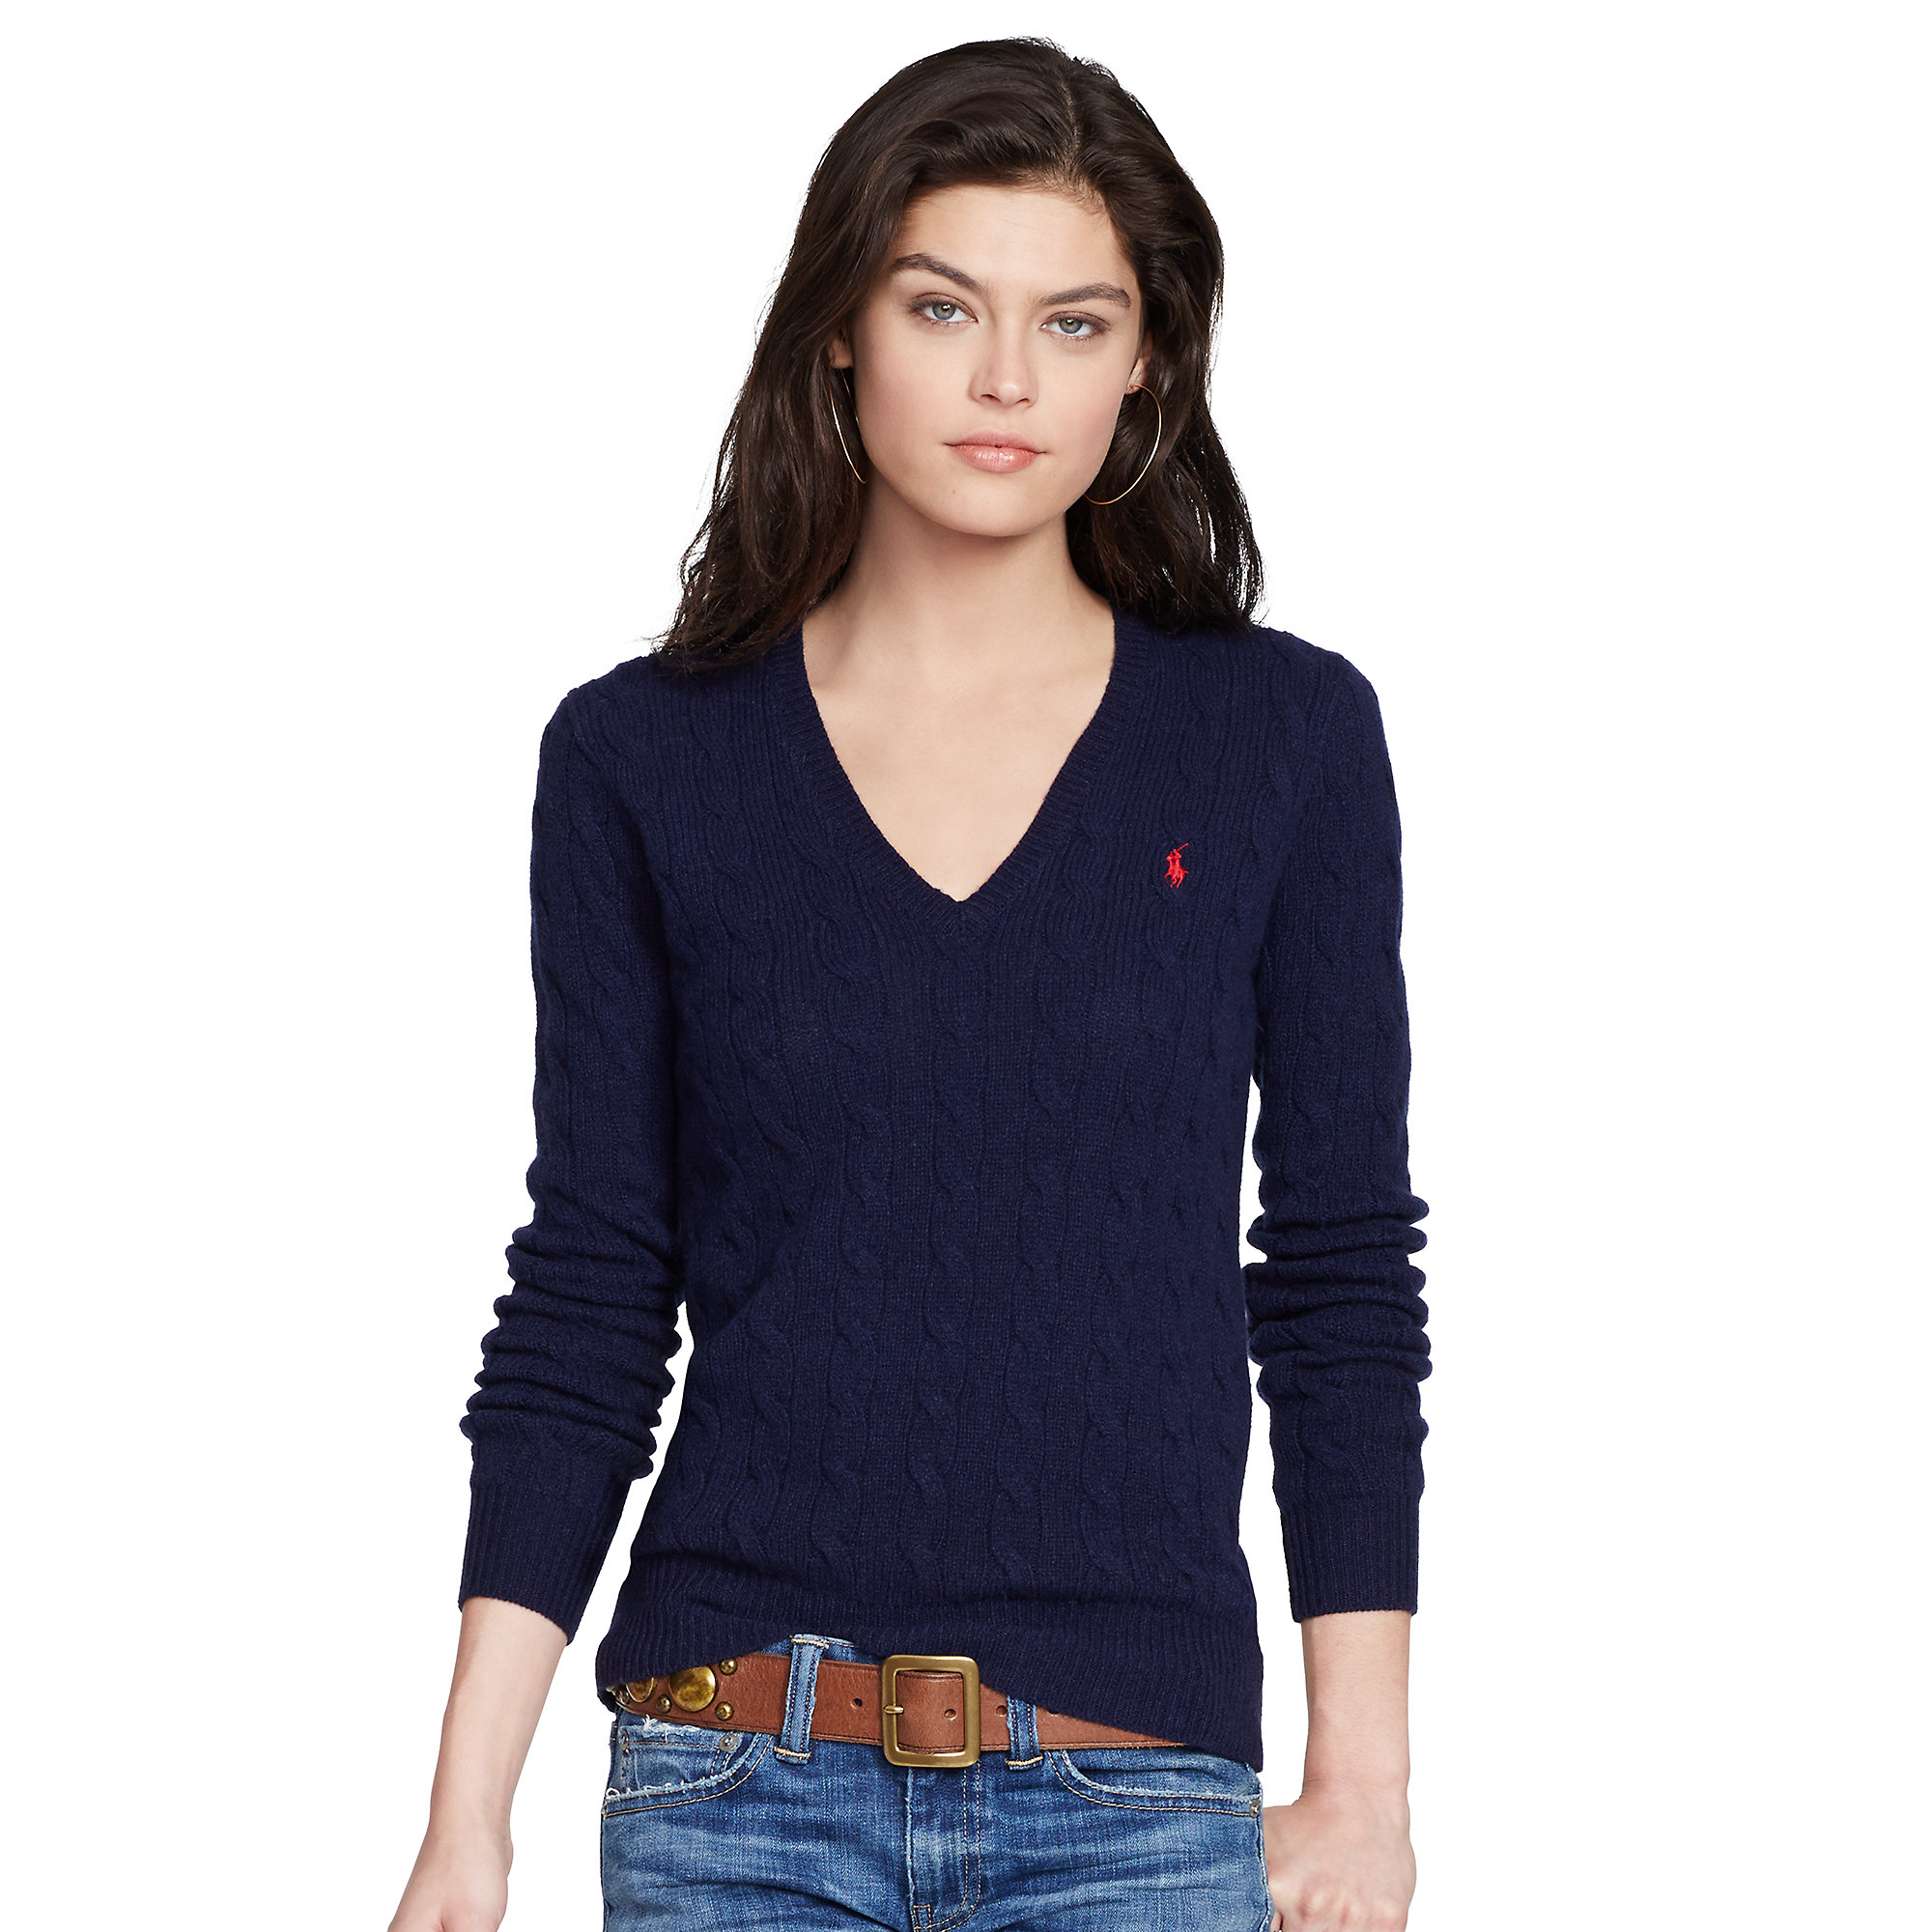 Lauren Ralph Lauren Cashmere Sweater - Cashmere Sweater England